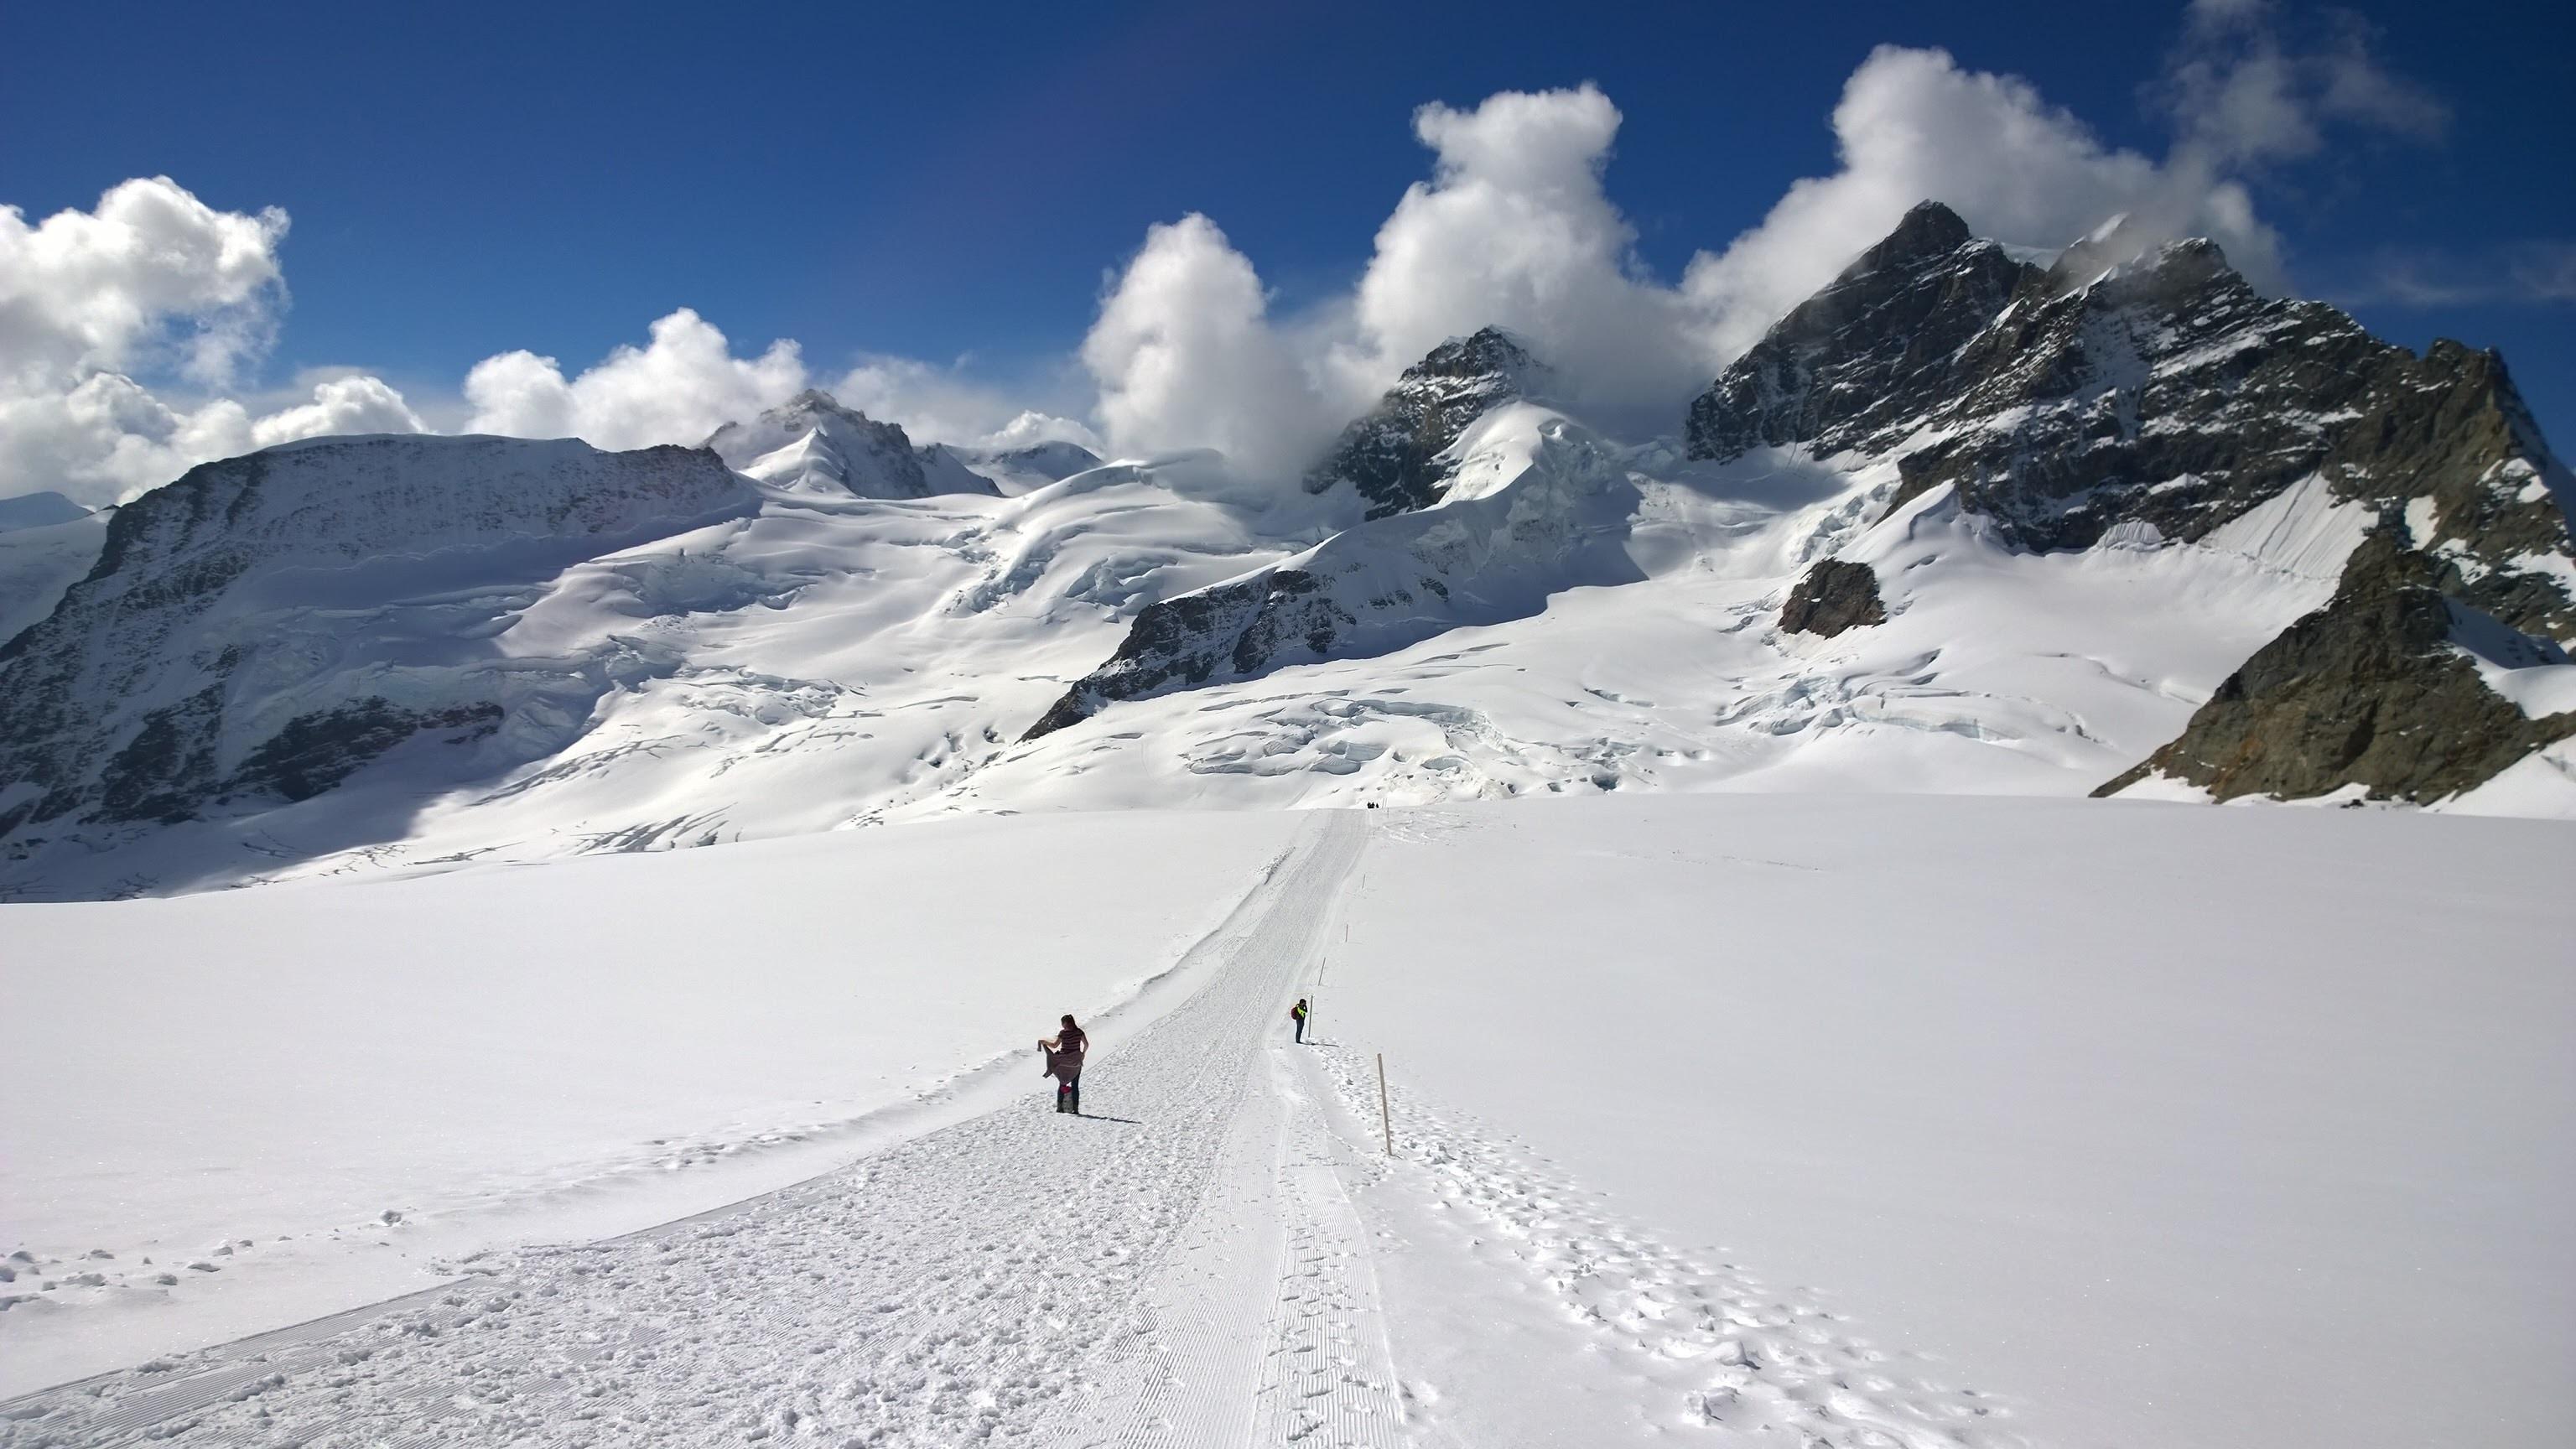 man walking through snowy mountain